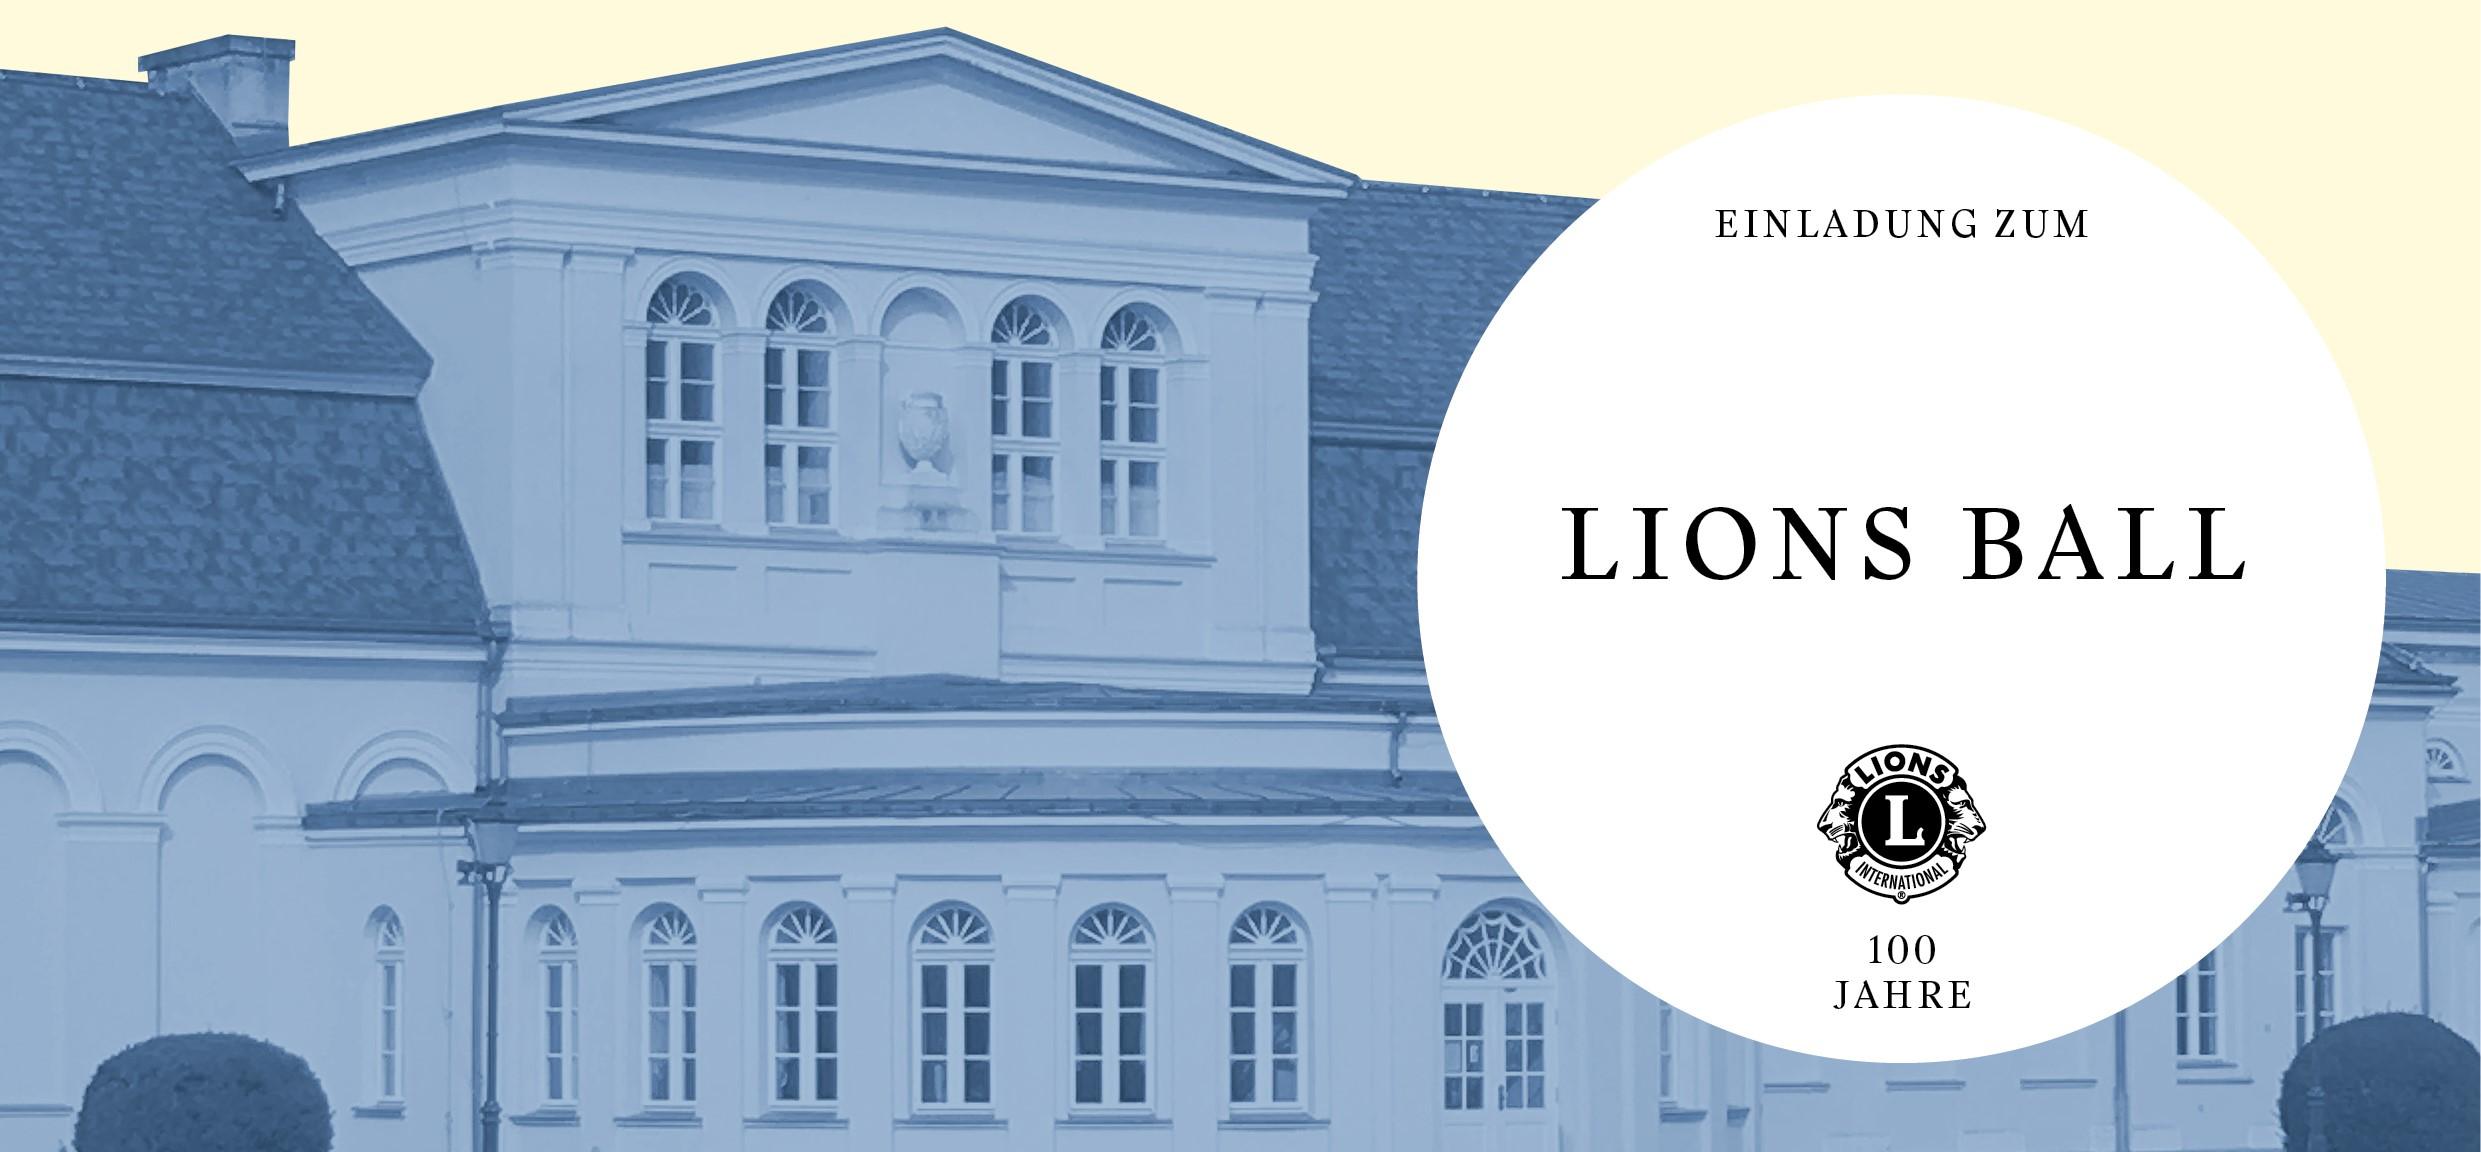 einladung_lionsball3